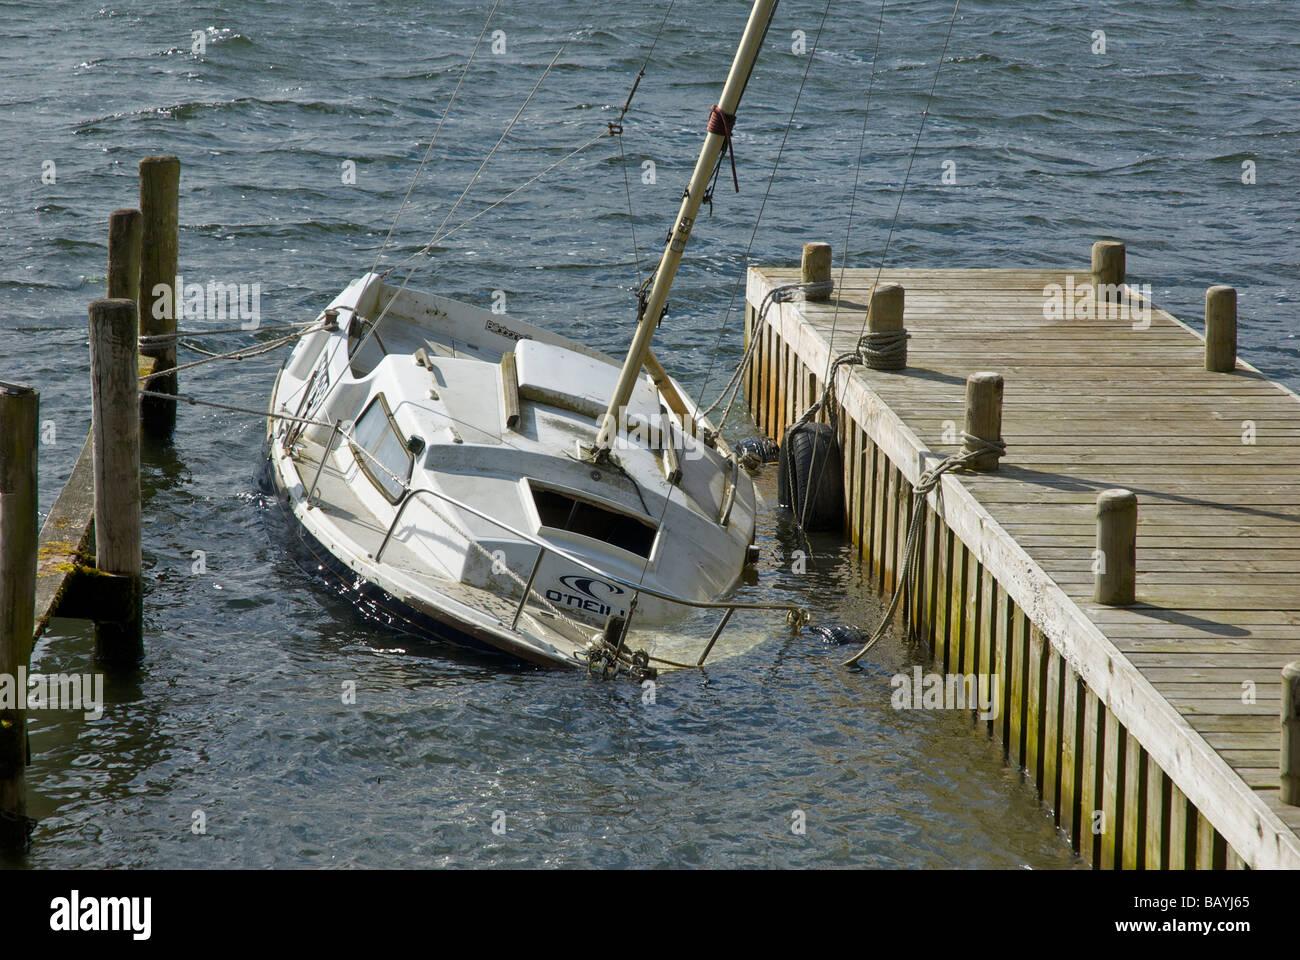 Sailing boat sunk, Lake Windermere, Lake District National Park, Cumbria, England UK - Stock Image